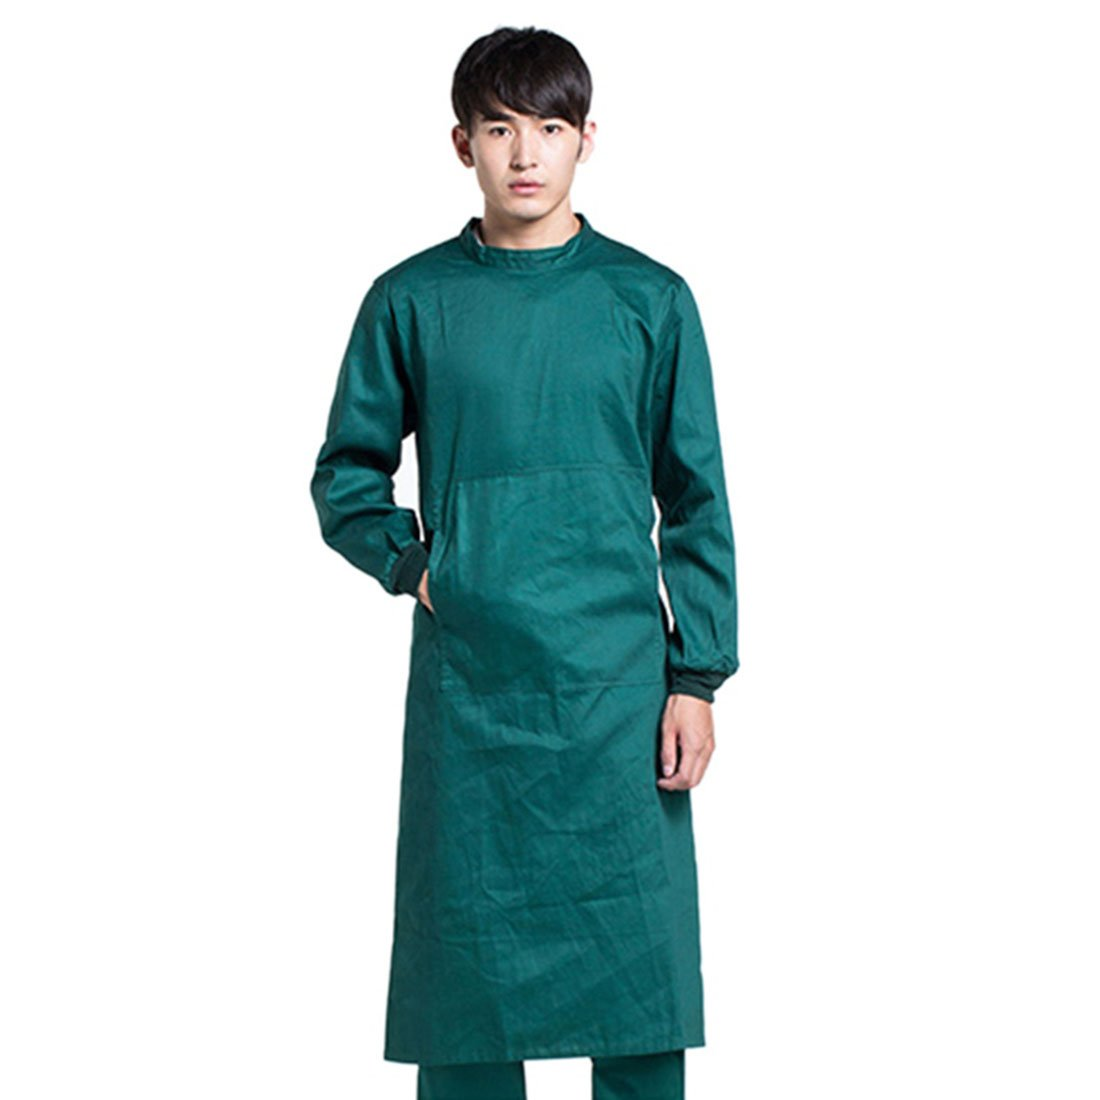 Liuzhou, Vestido de Manga Larga, Novedad, Cirujano Maestro ...